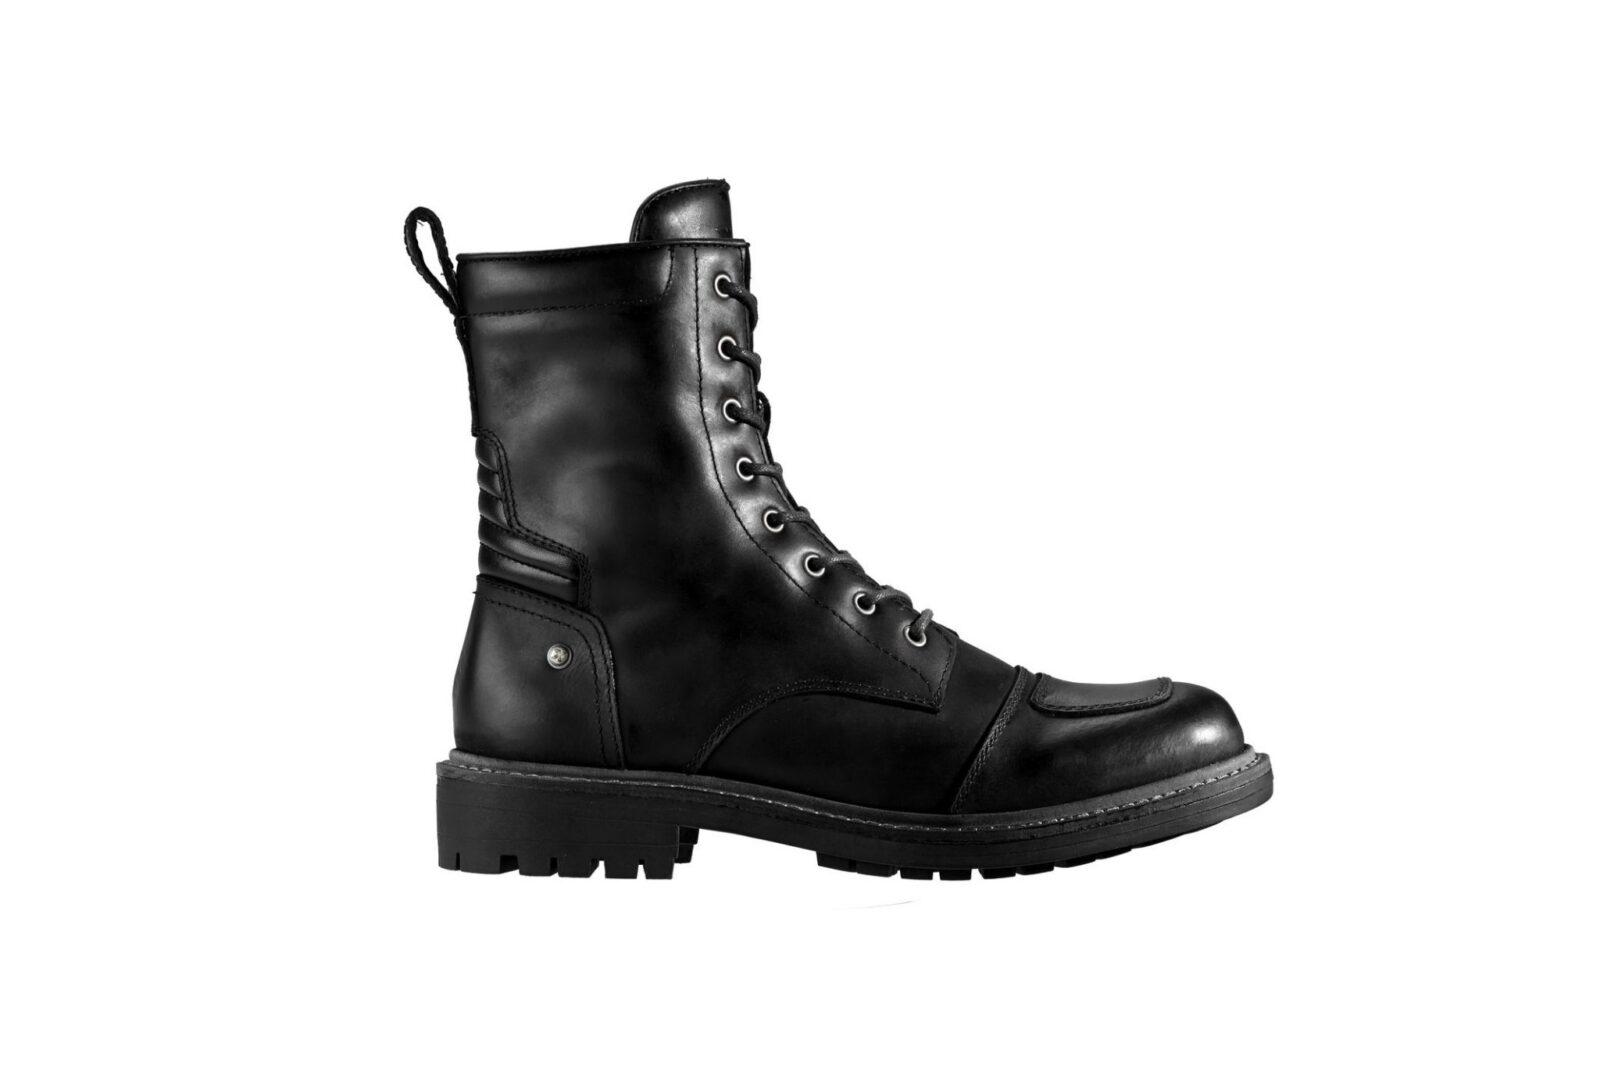 Spidi X Nashville Boots 1600x1086 - Black or Tan: The Spidi X-Nashville Boots